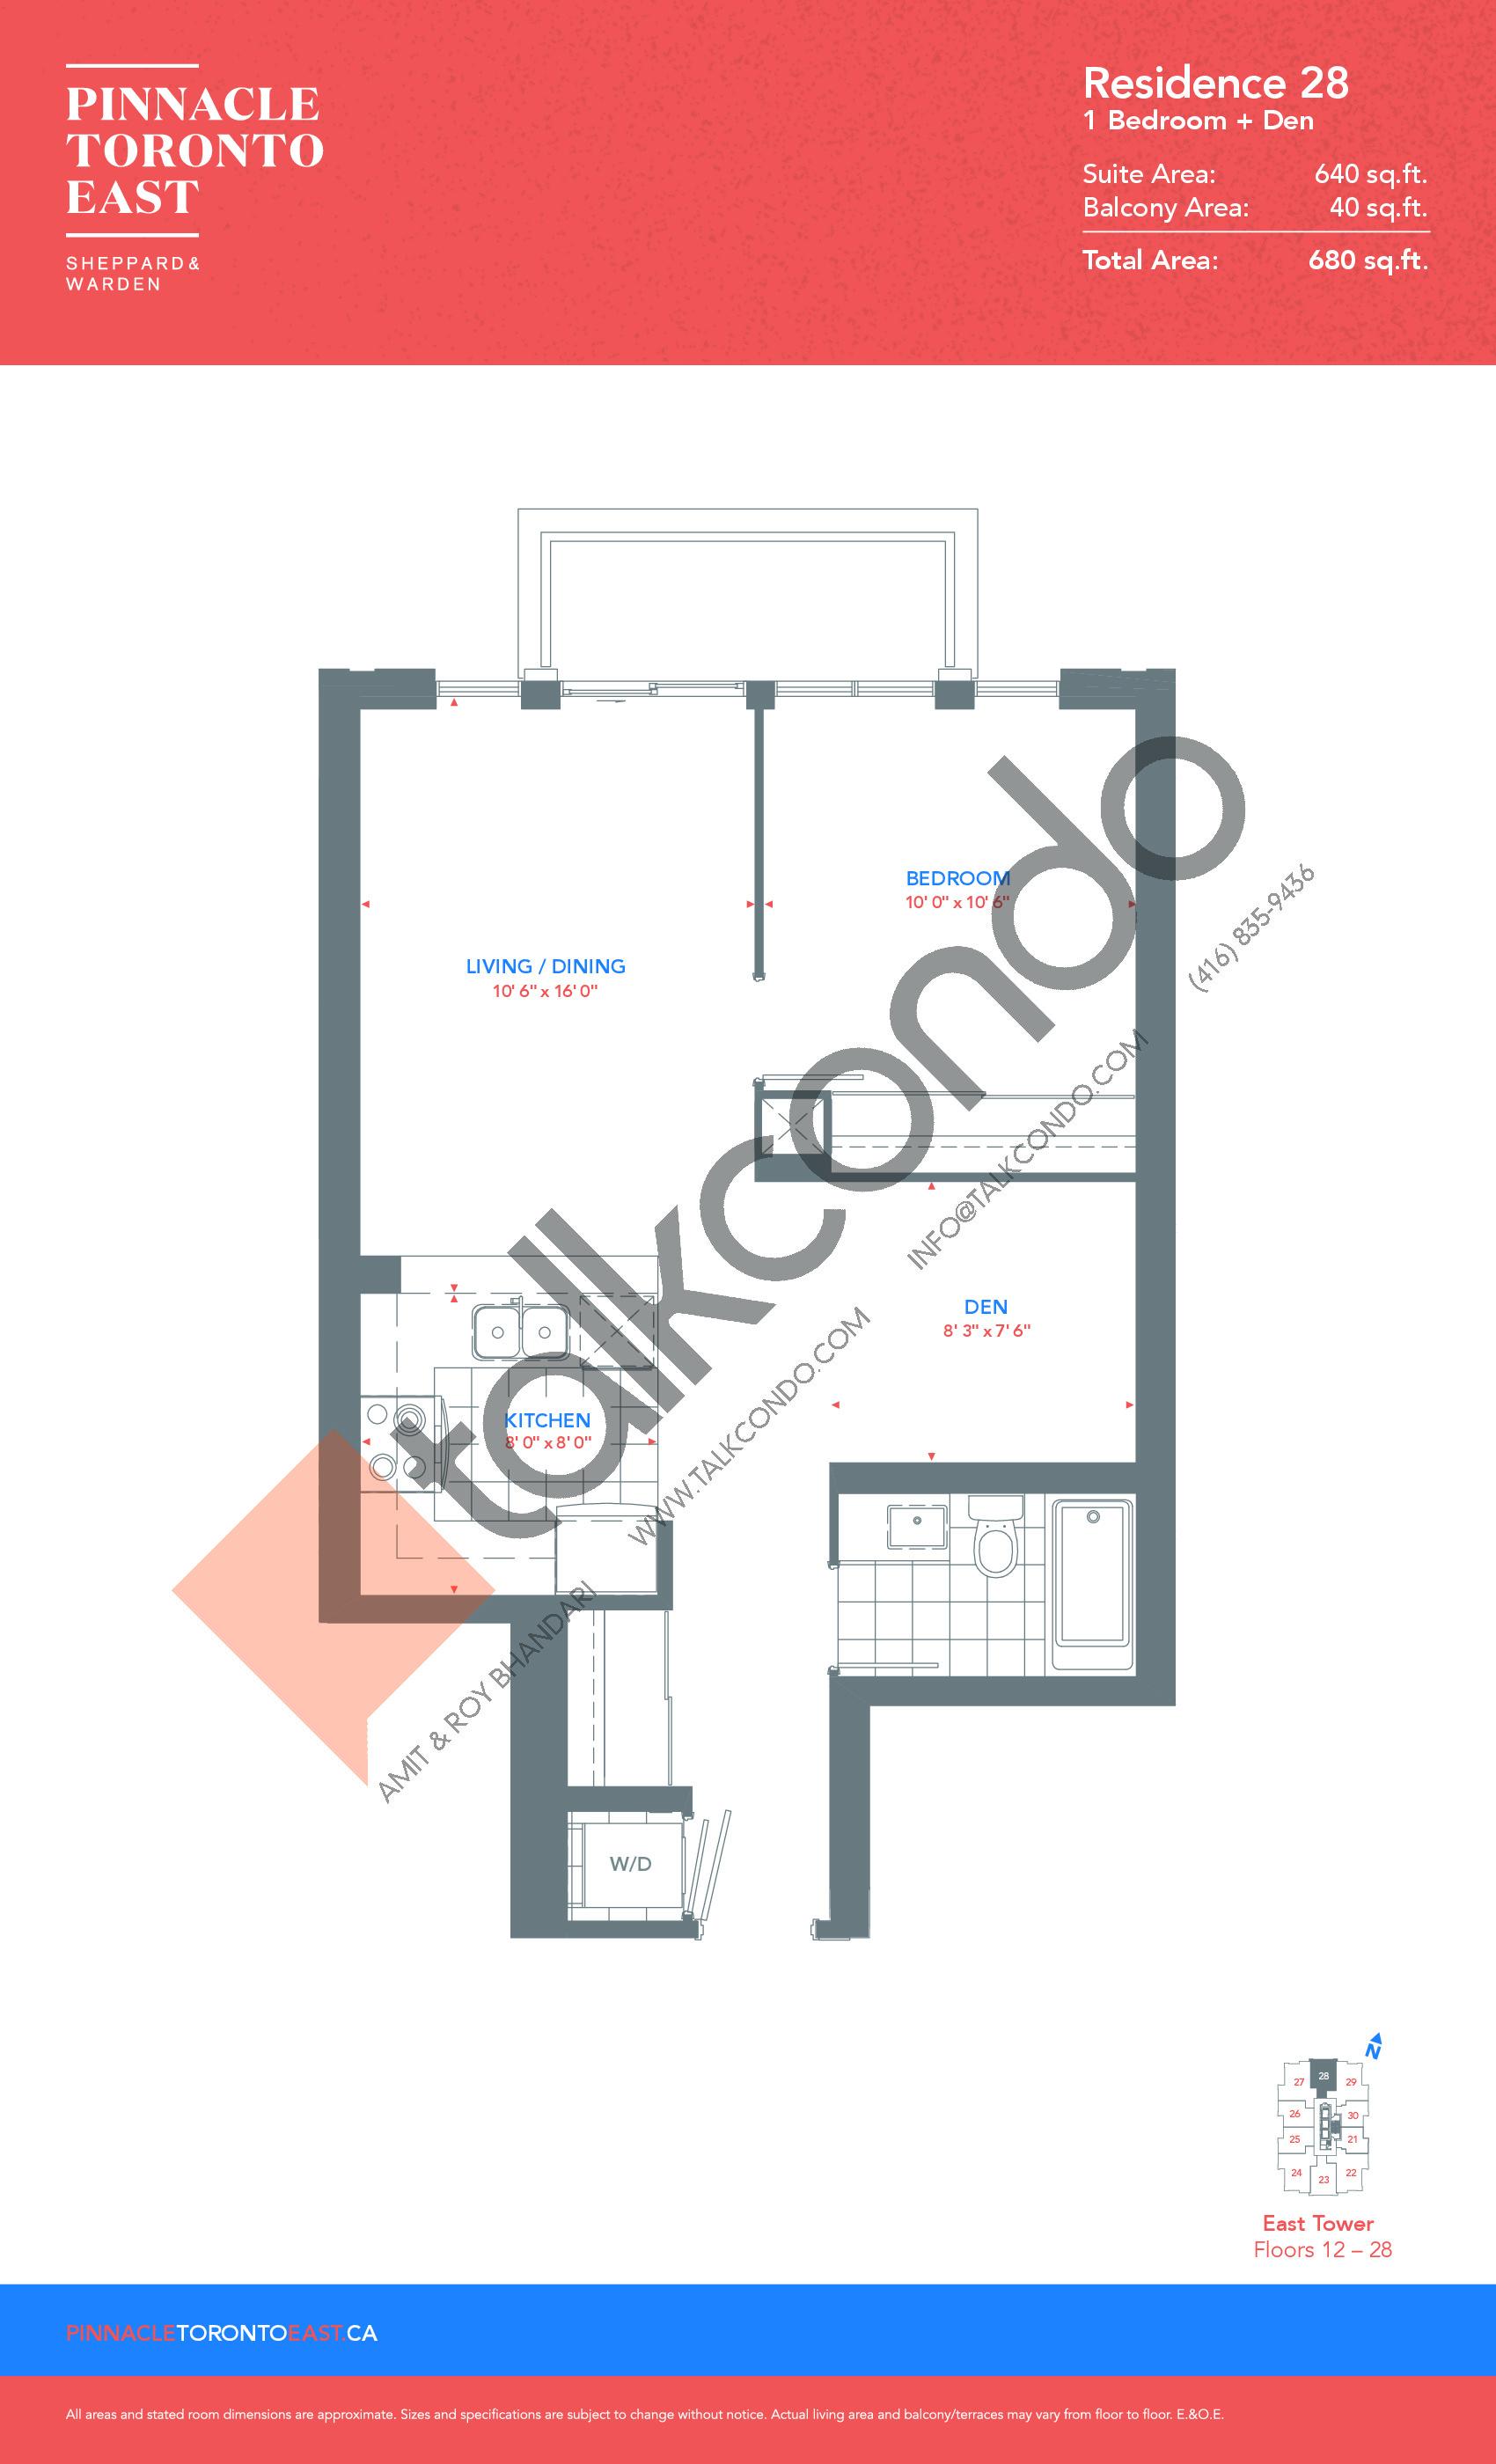 Residence 28 - East Tower Floor Plan at Pinnacle Toronto East Condos - 640 sq.ft